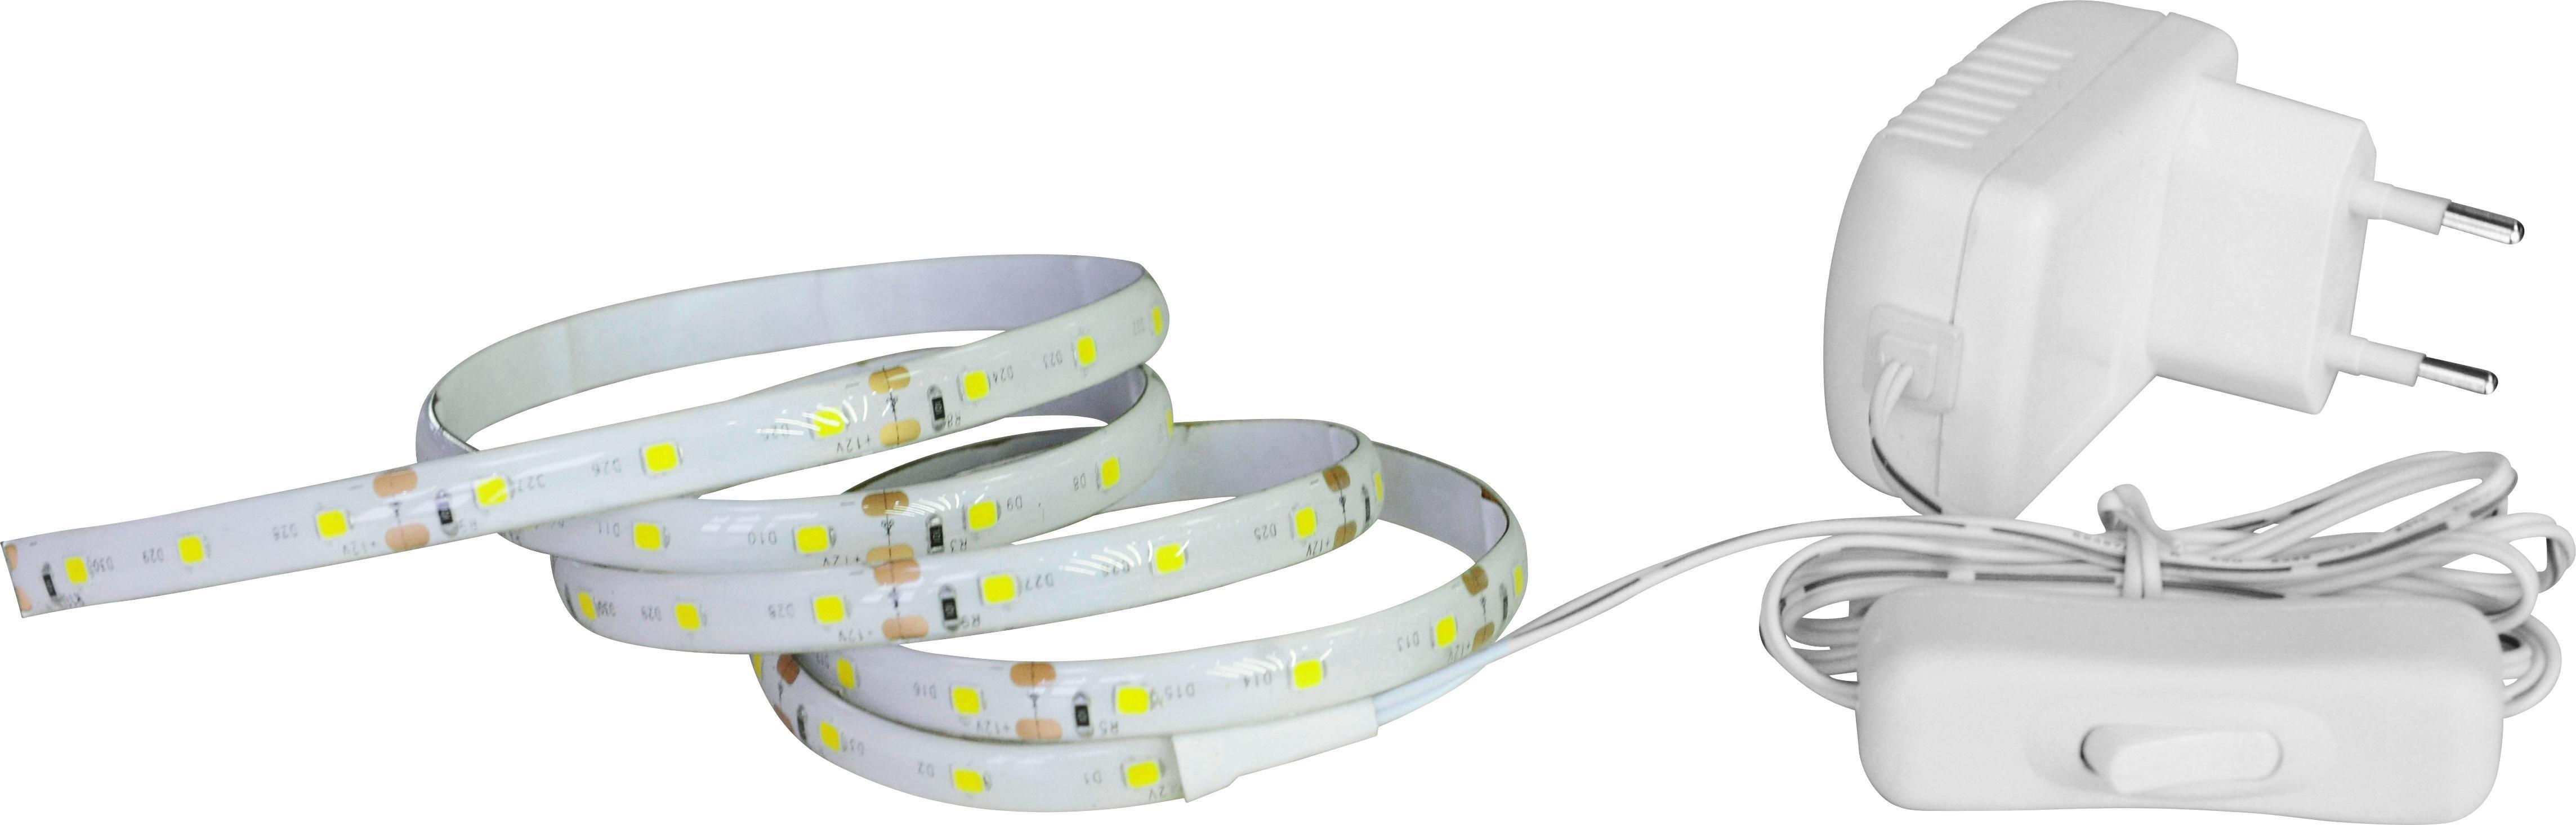 LED-Dekoleuchte Kurt, max. 6 Watt - Weiß, Kunststoff (100/1/0,3cm) - MÖMAX modern living